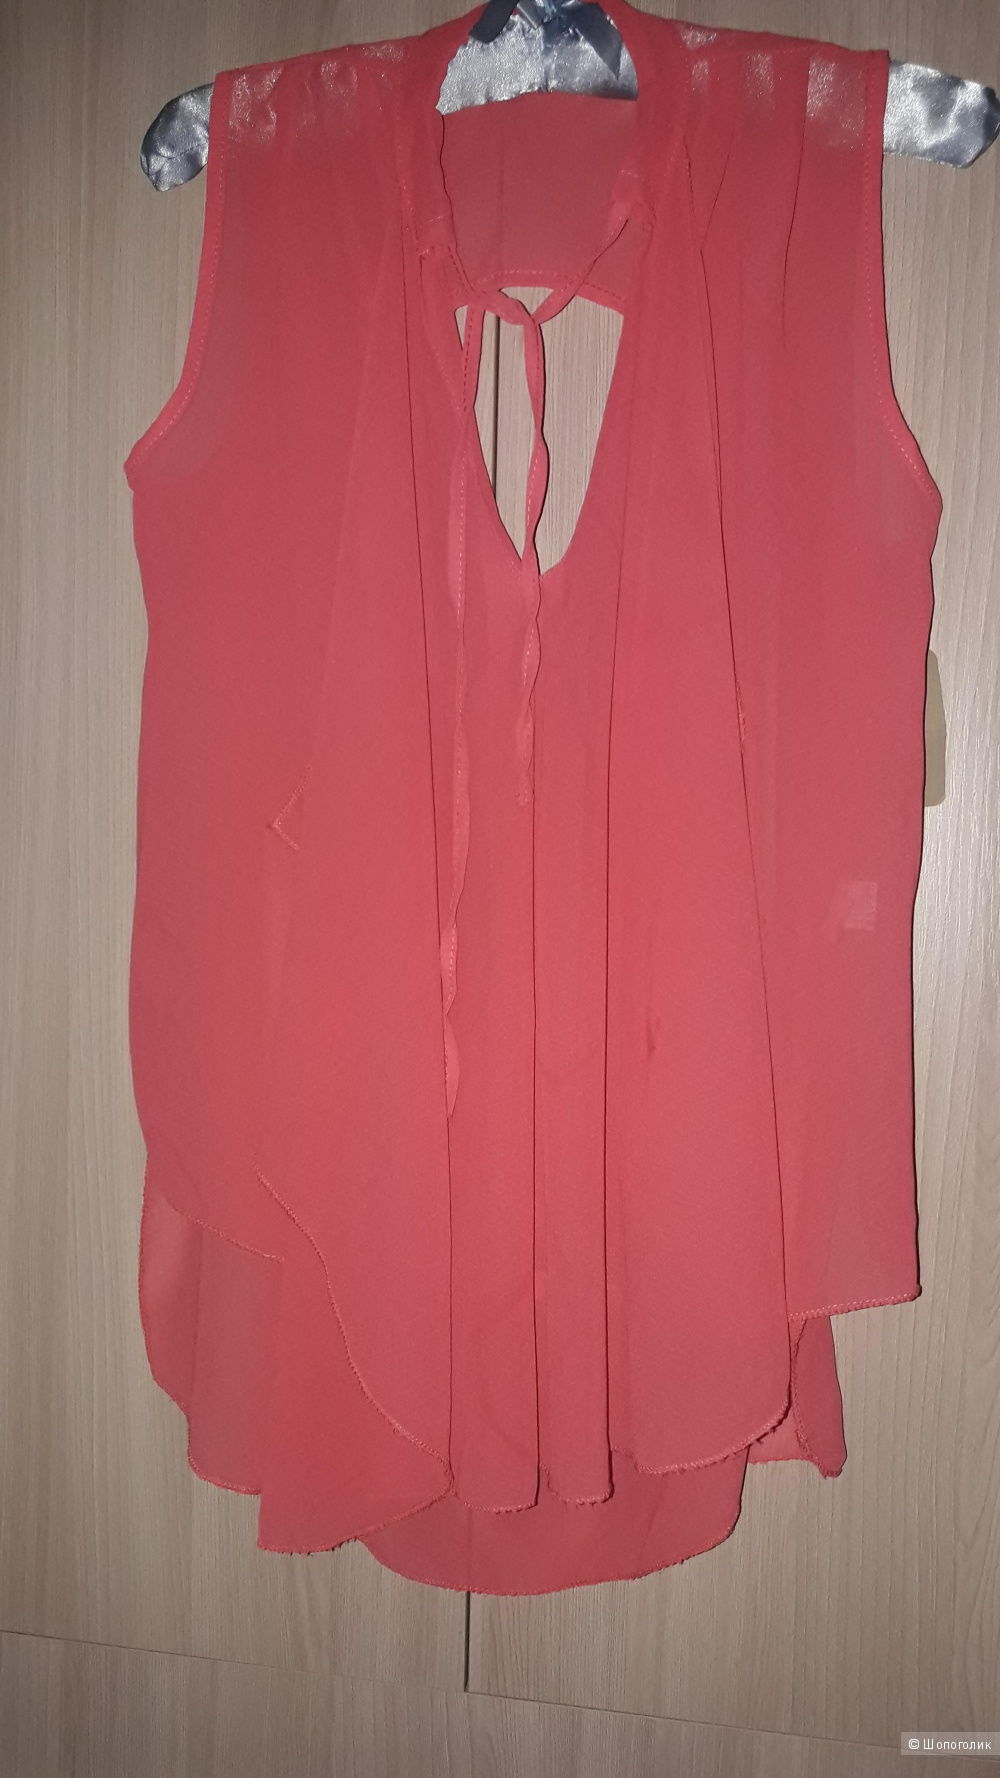 Шифоновая блузка-топ, размер 46-48